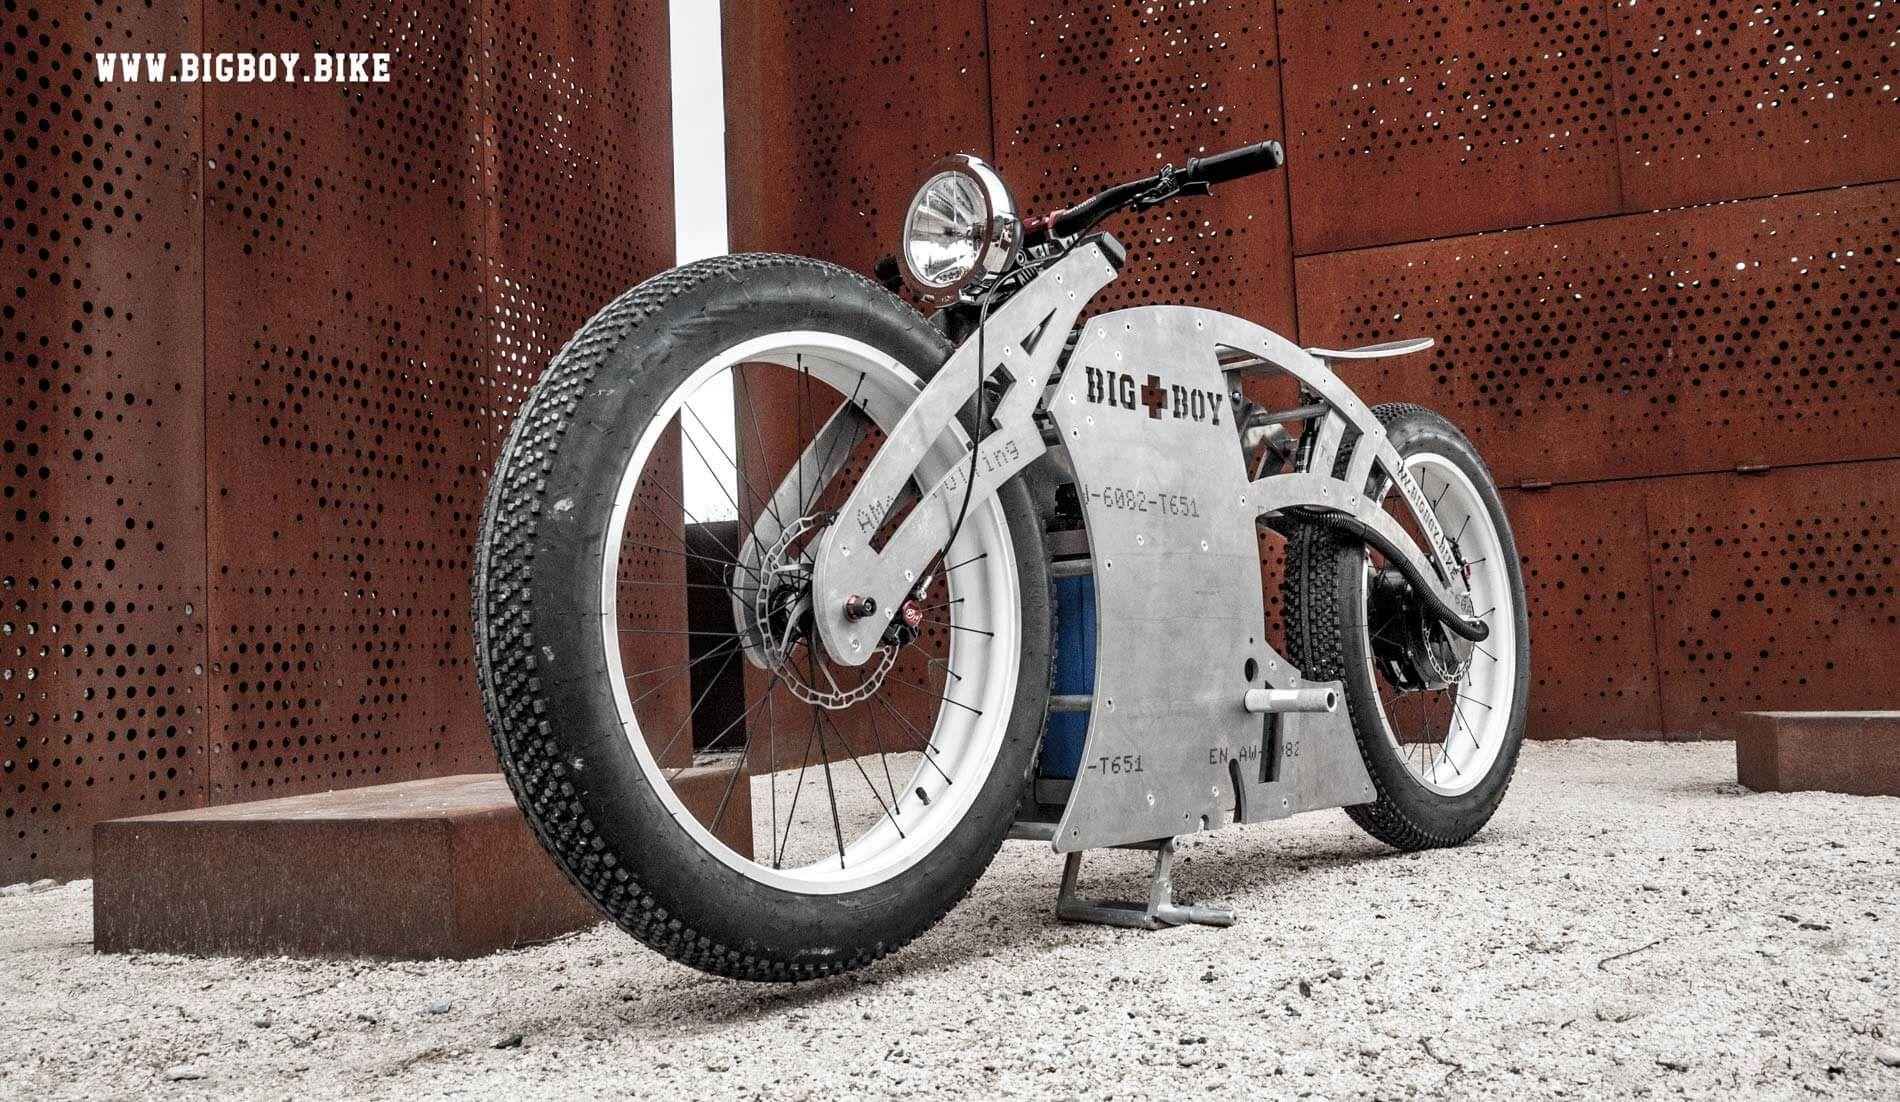 Liberator Electric Bicycle Recalls Vintage Motorcycles EVWORLD